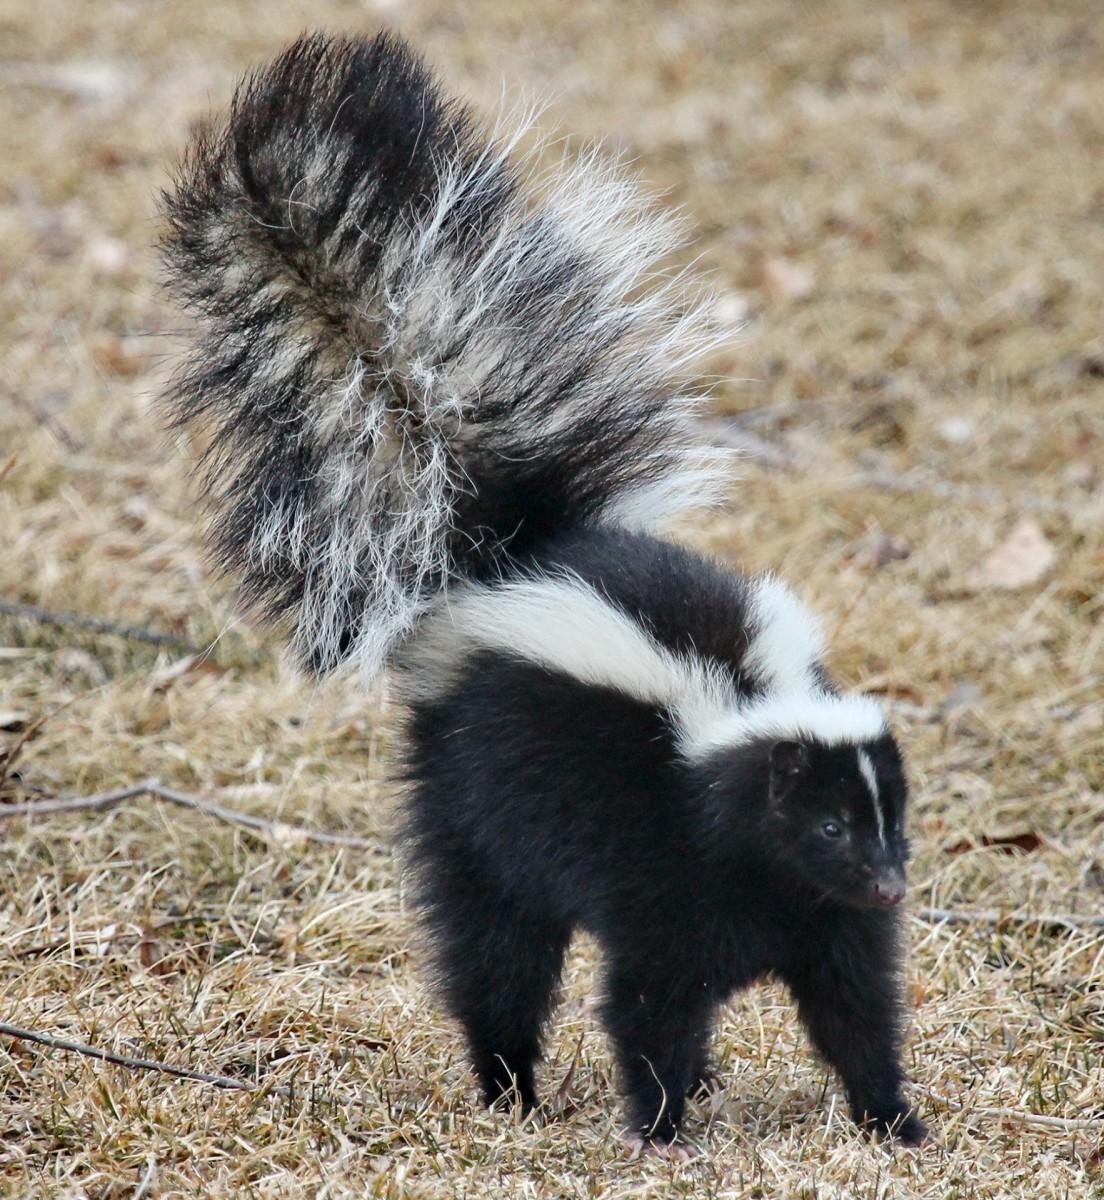 The skunk.